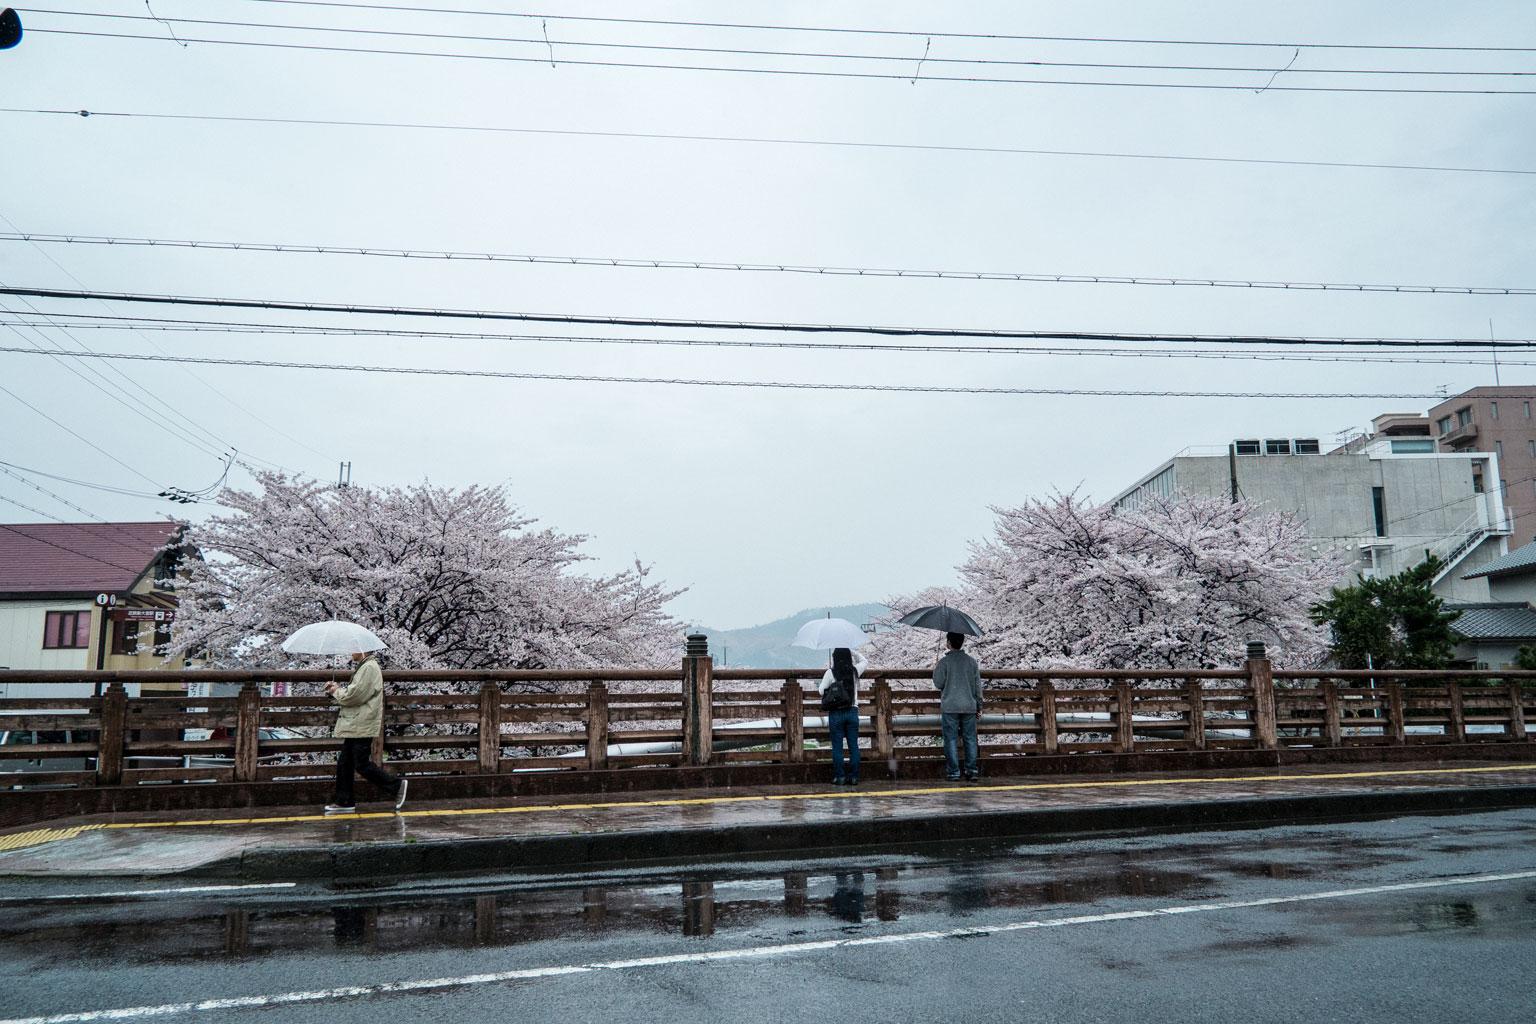 120410_PR_Japan_06_F10726.jpg